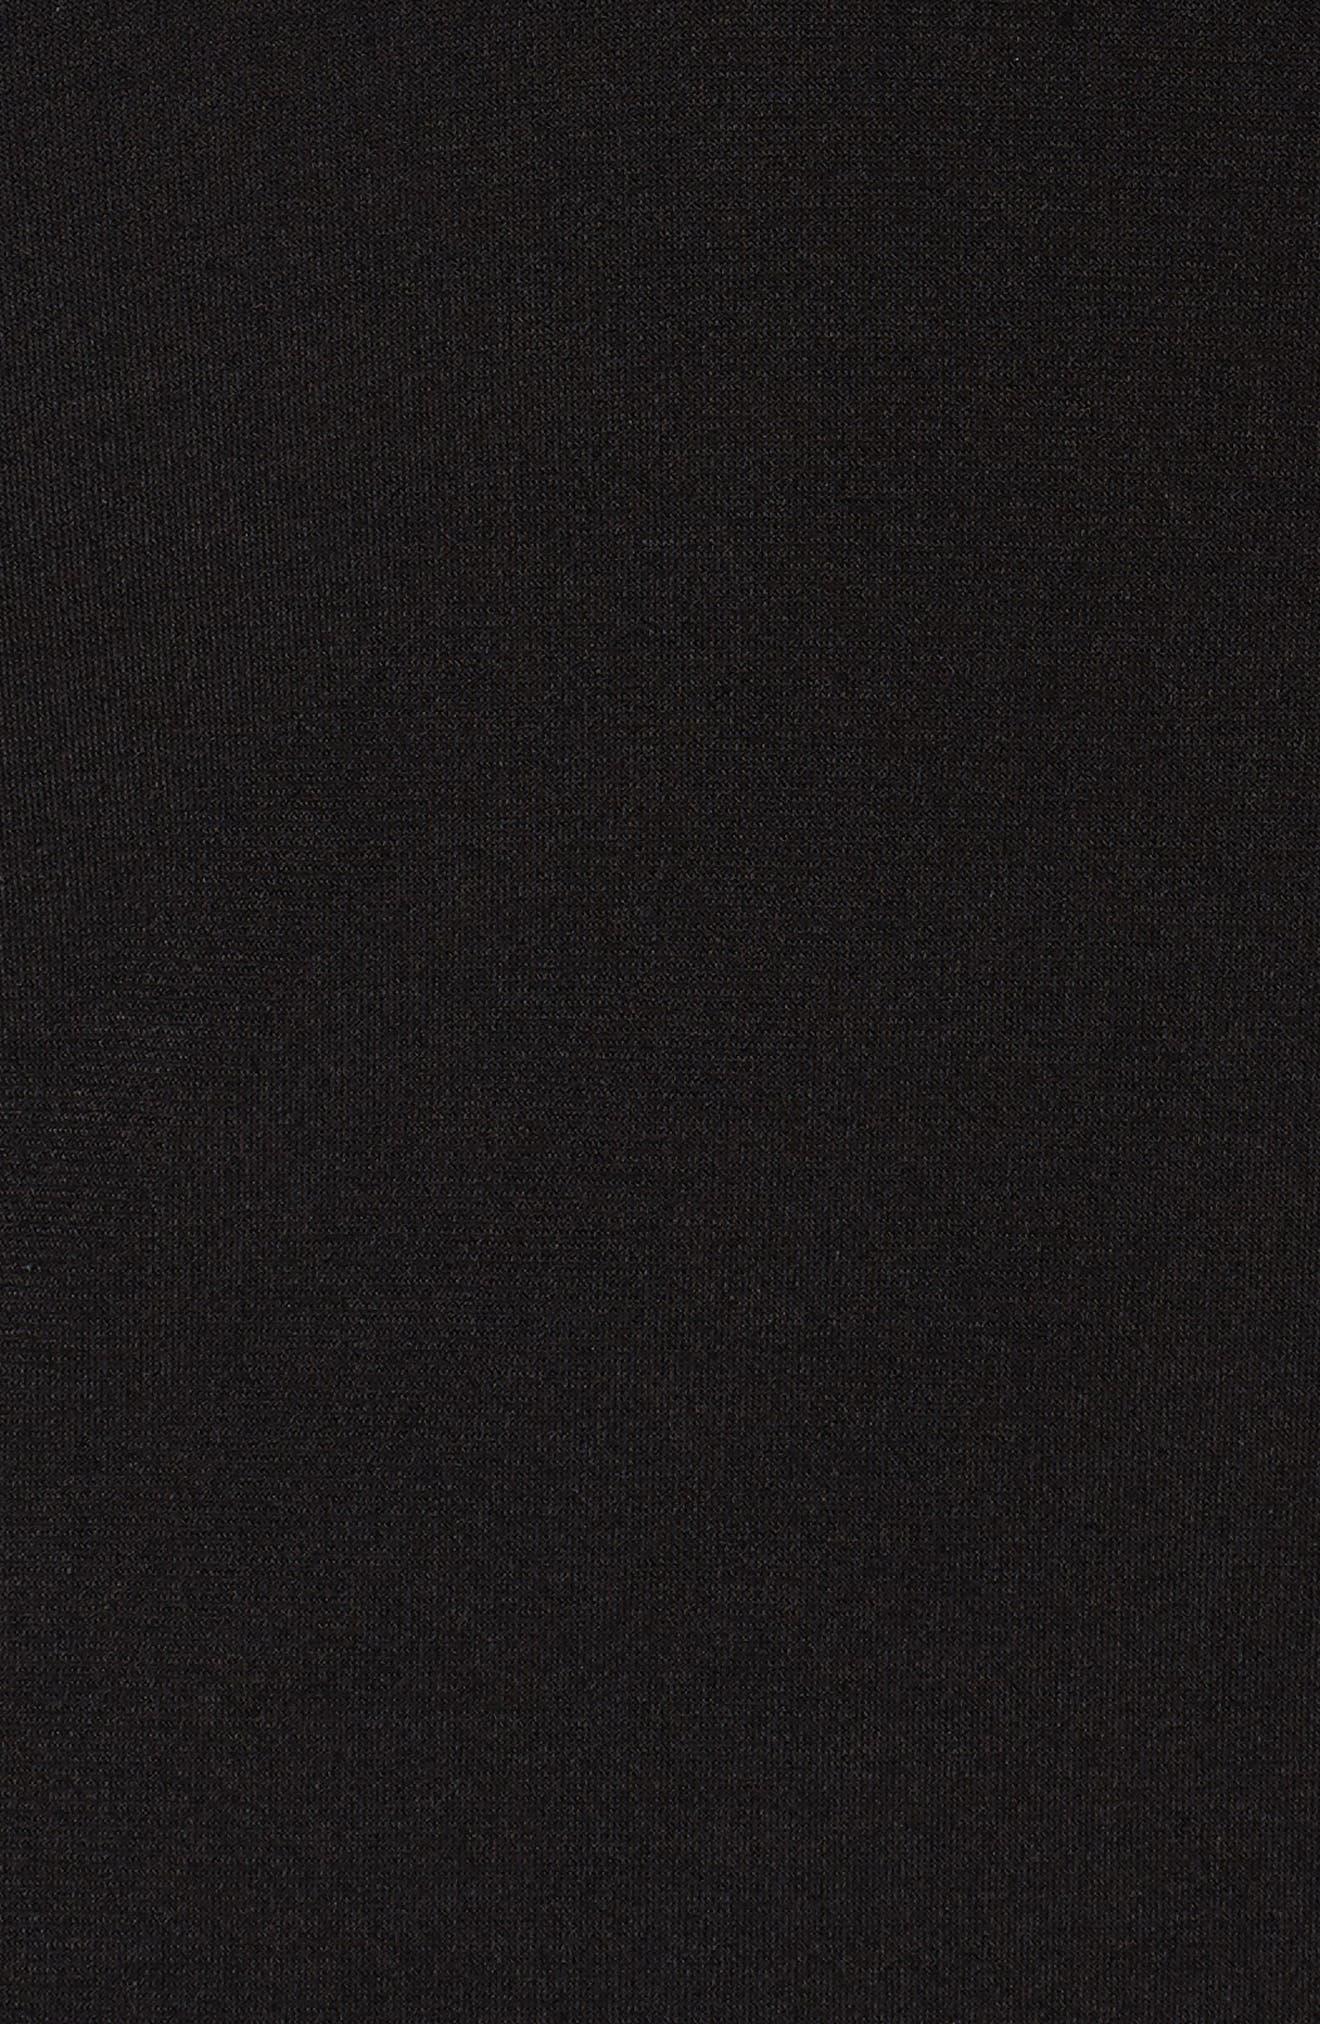 Alternate Image 5  - MICHAEL Michael Kors Cold Shoulder Crepe Top with Faux Leather Trim (Plus Size)